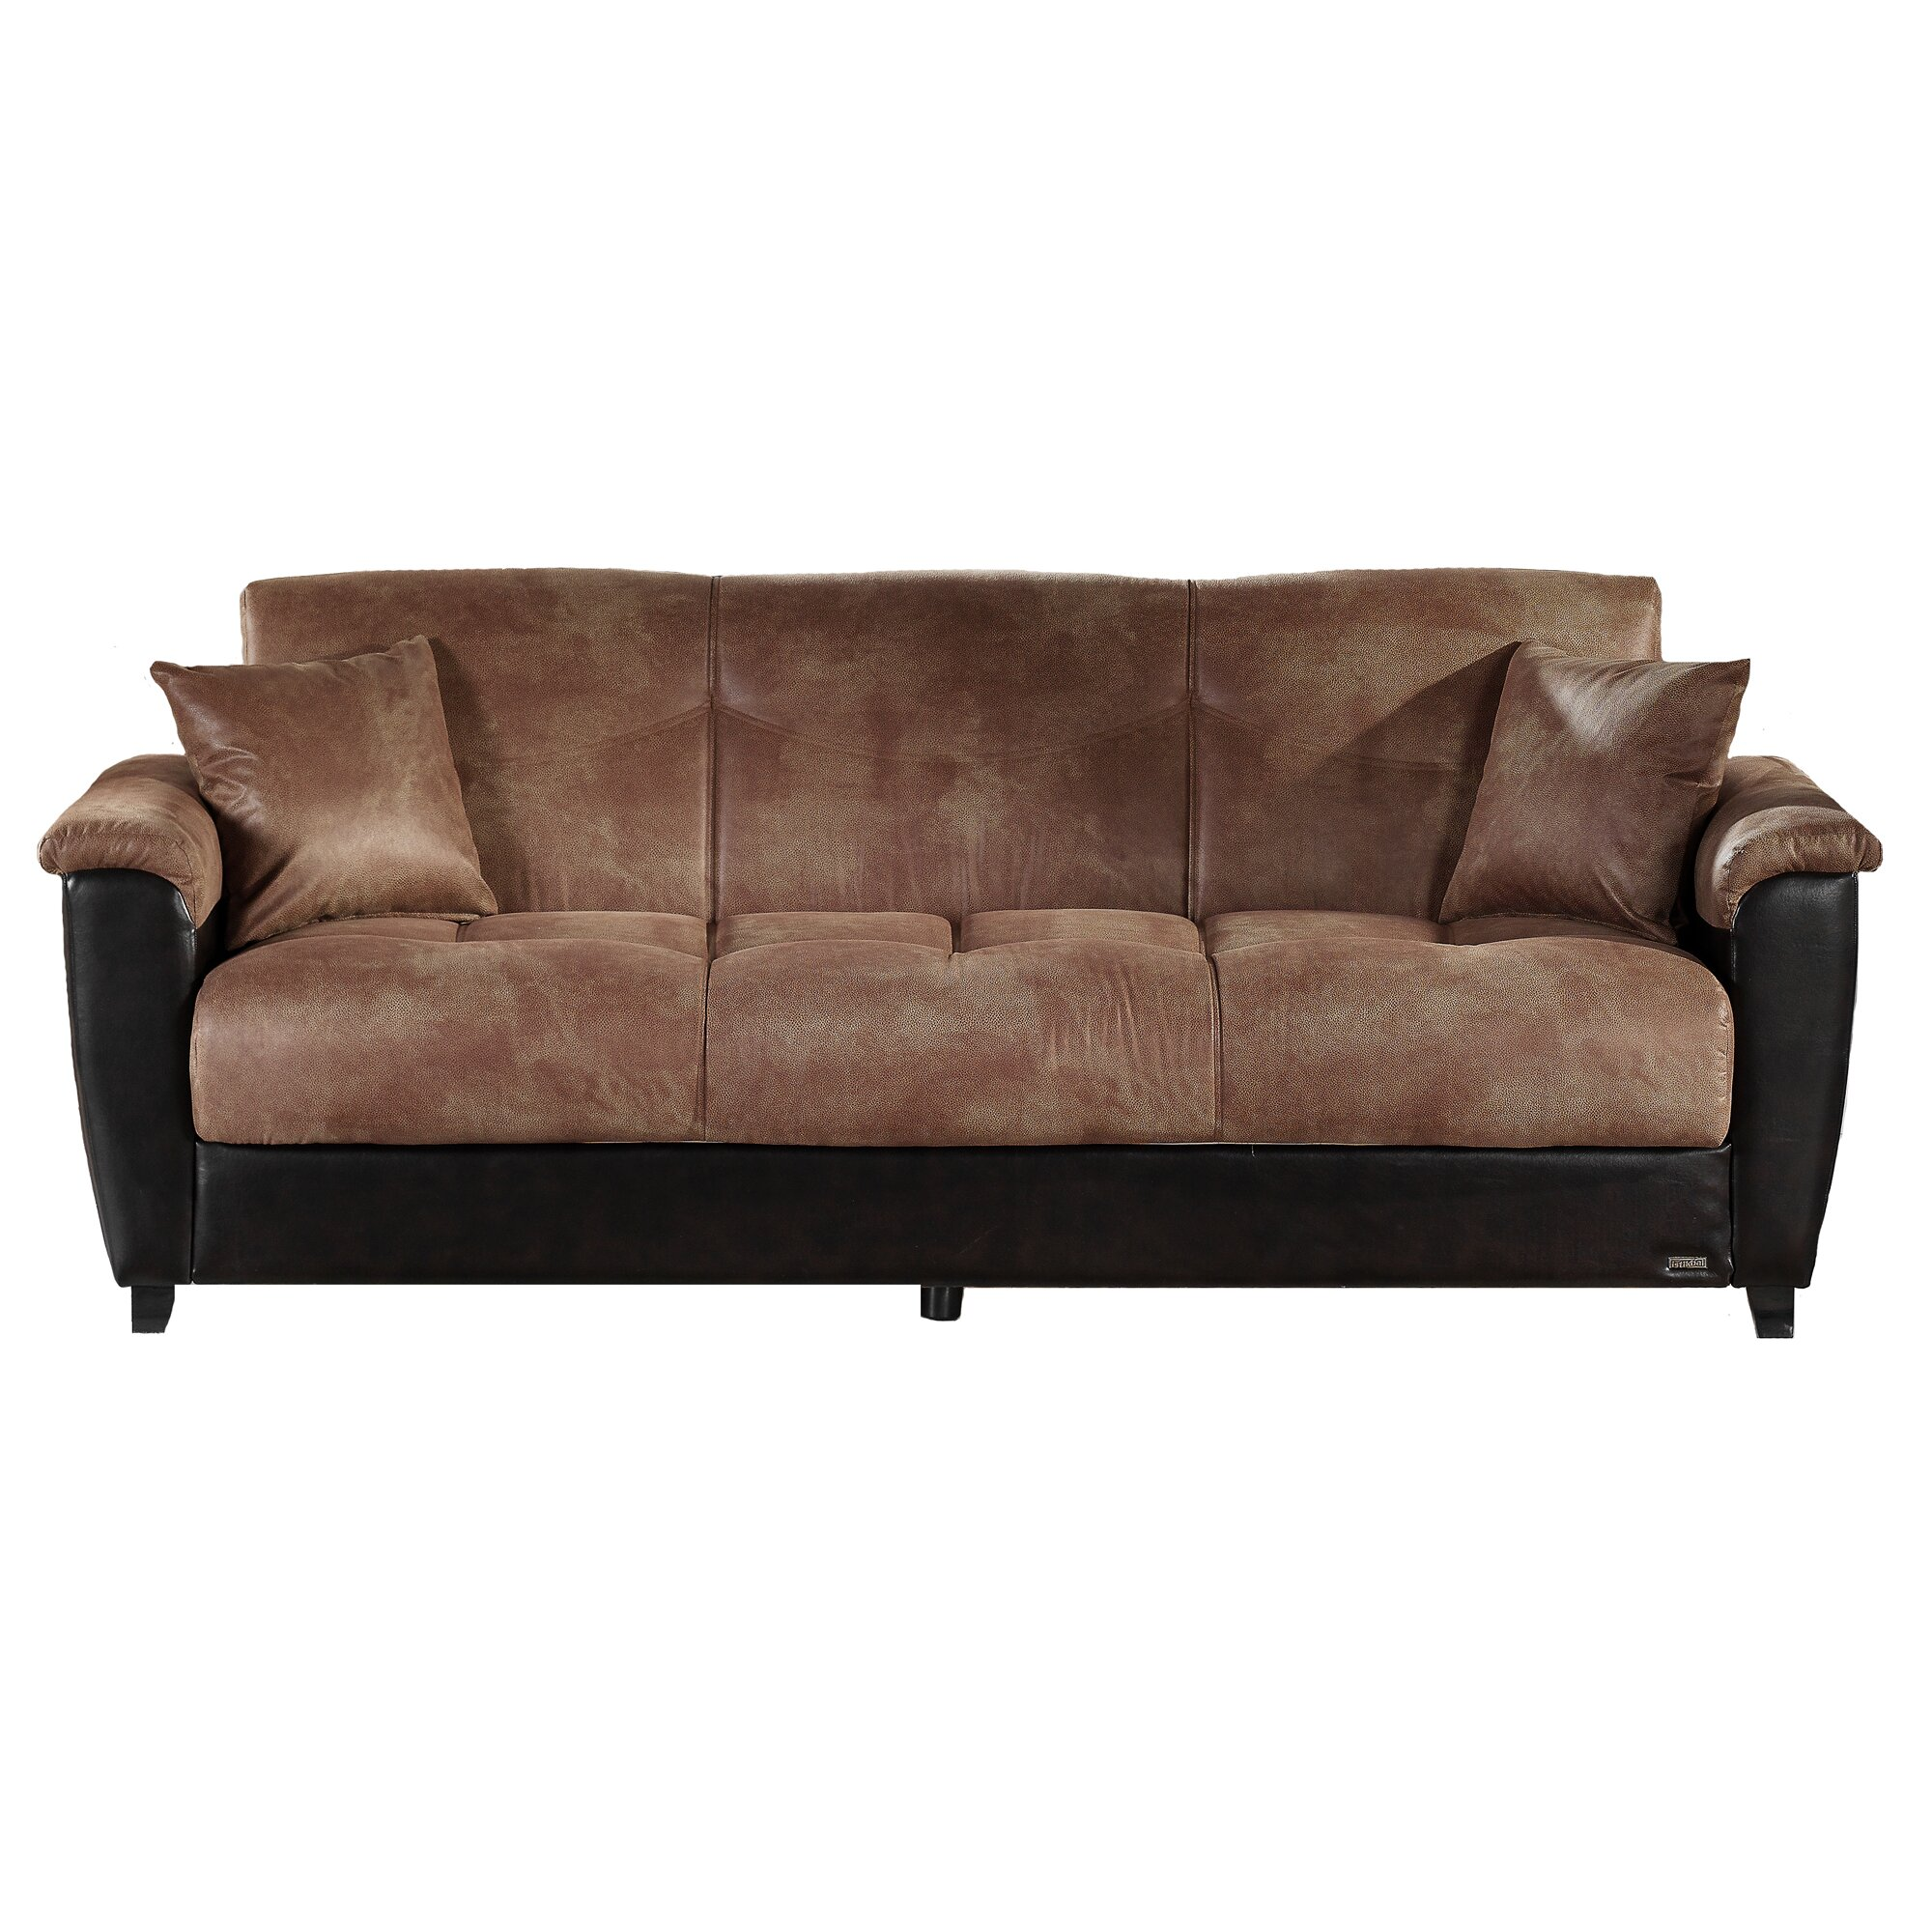 Bradington Young Furniture Reviews Istikbal Aspen Sleeper Sofa picture on Istikbal Aspen Sleeper Sofa ...